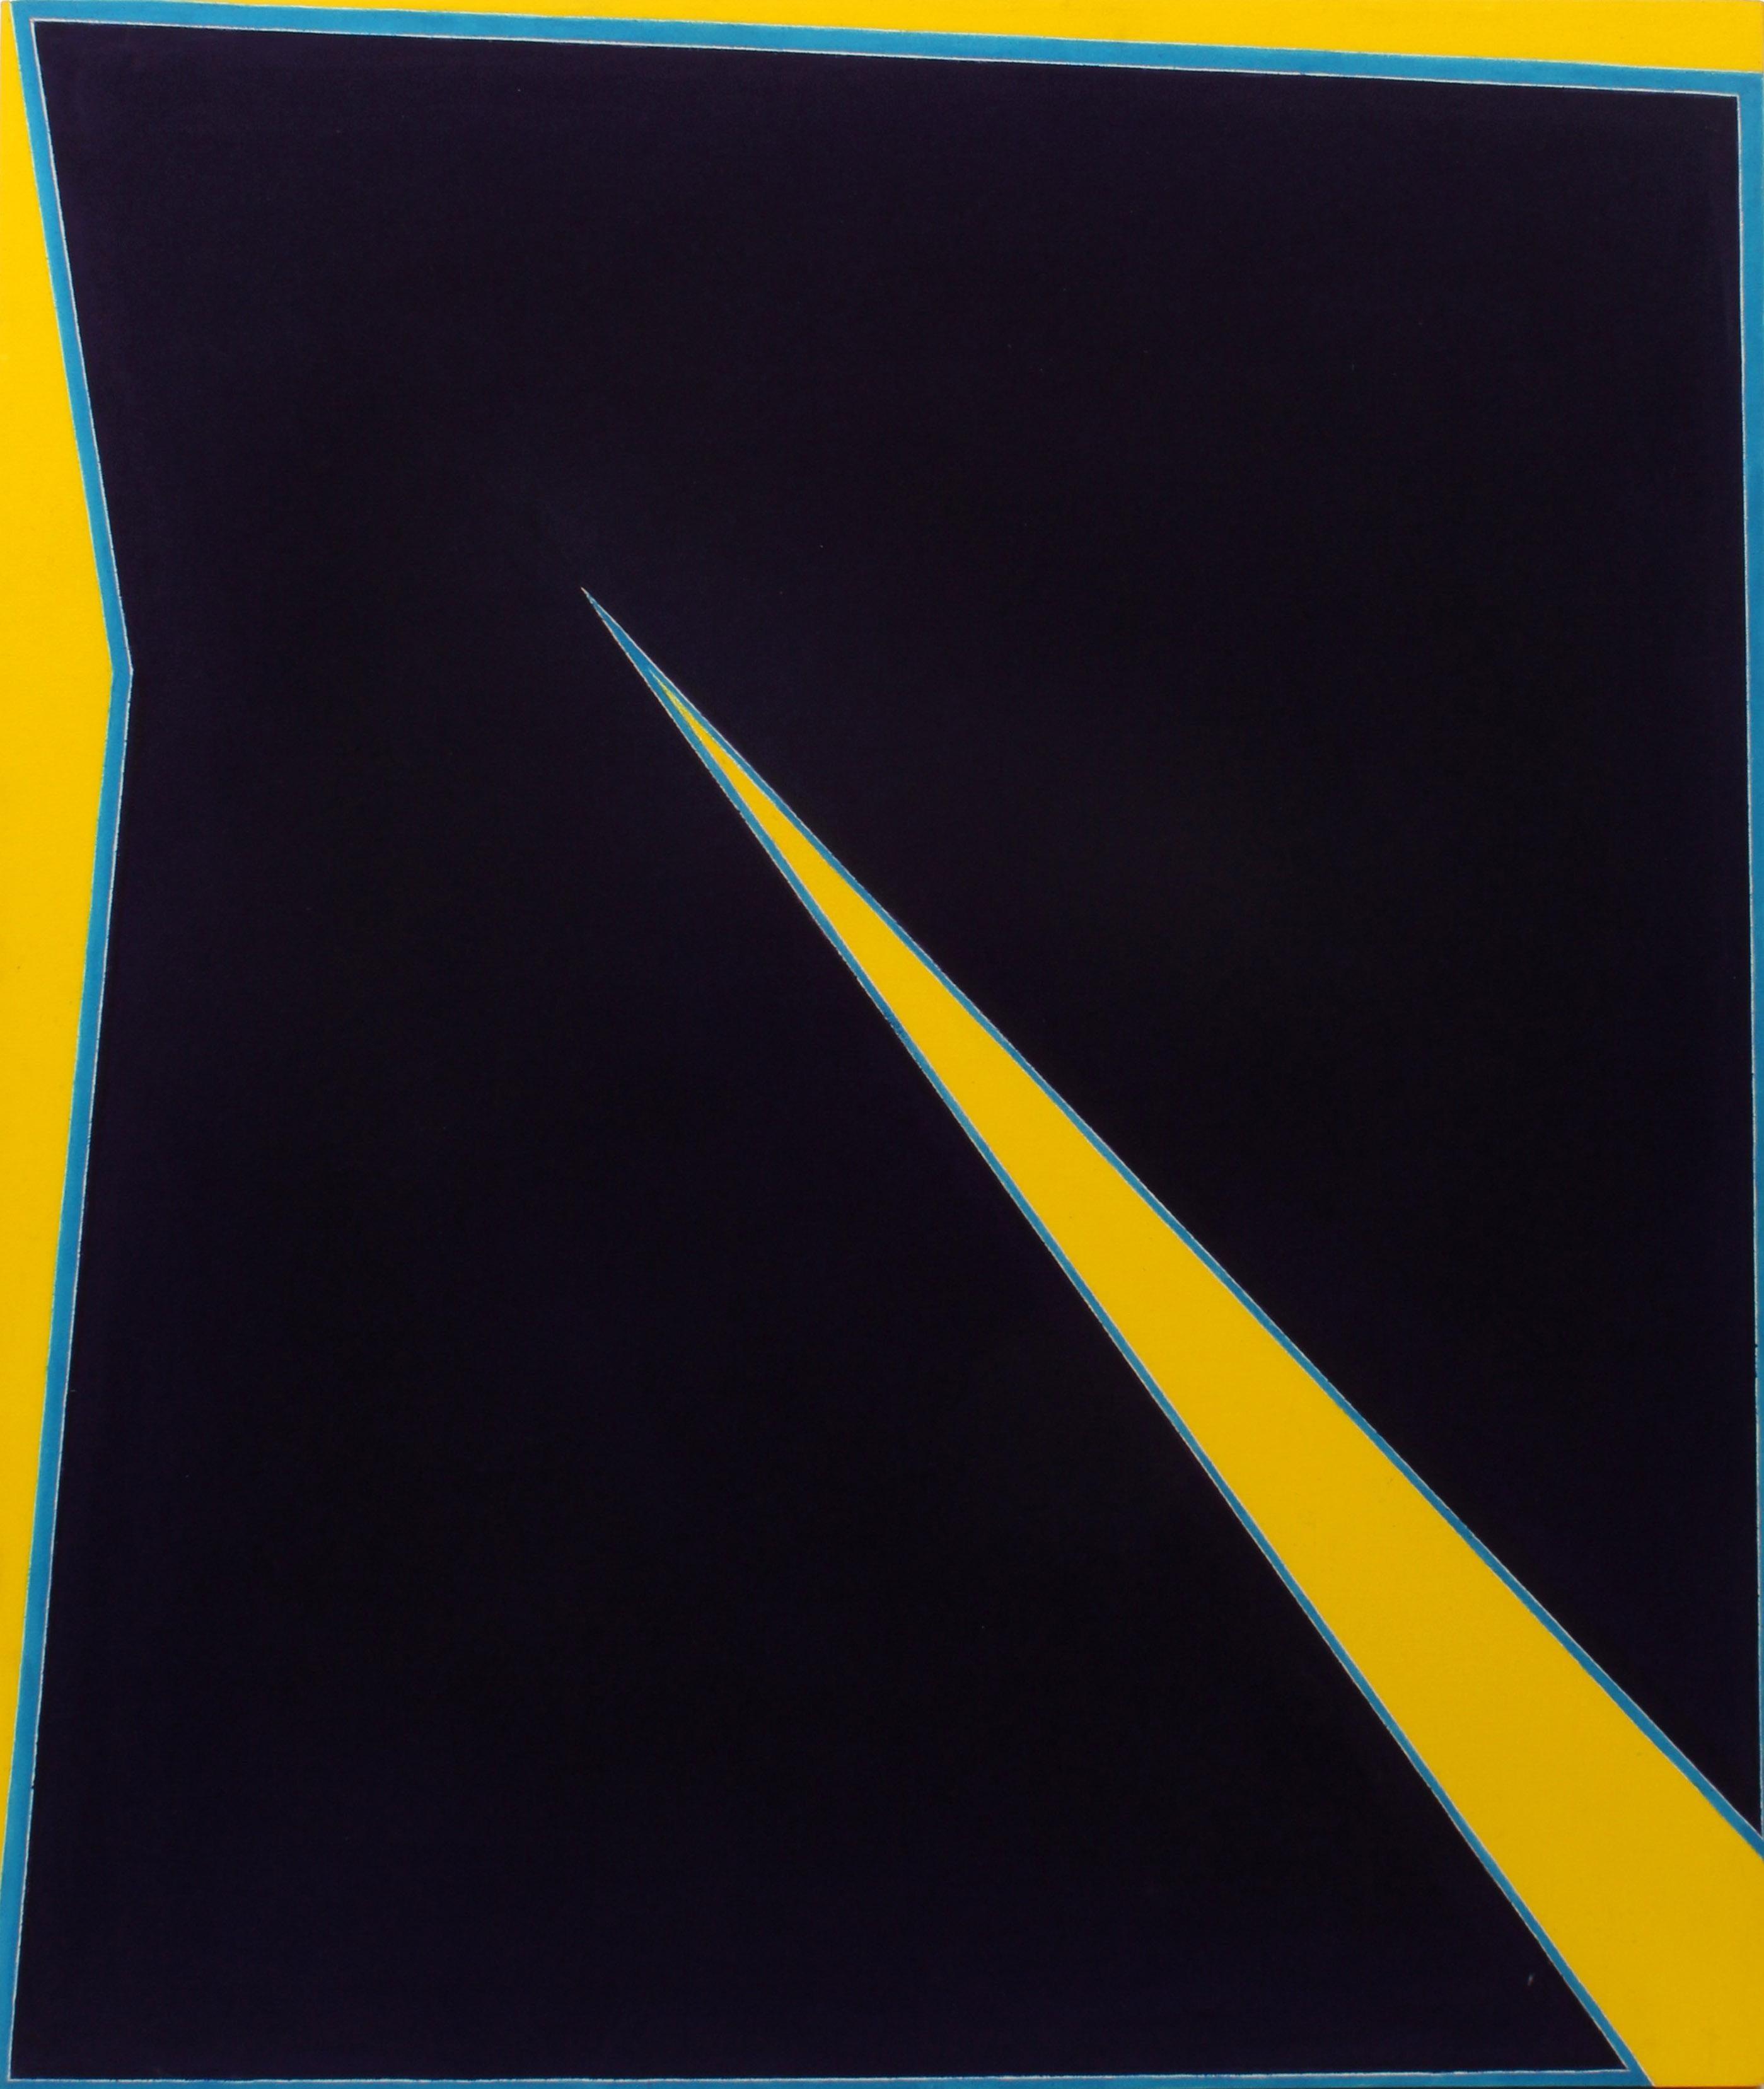 Minimalist Painting New York American Artist Female Blue Black Yellow 1974